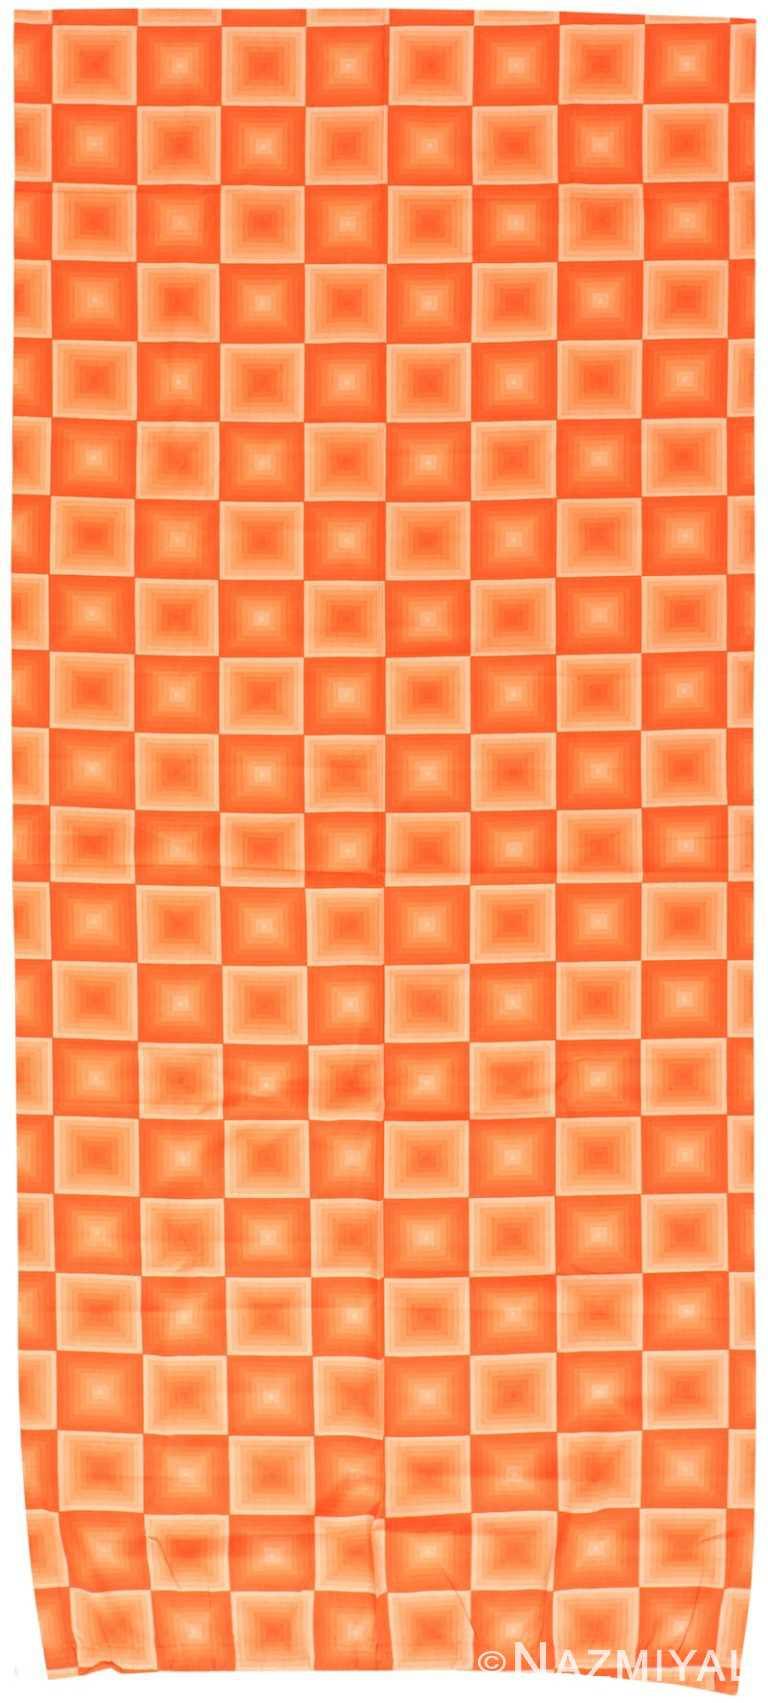 Vintage Scandinavian Verner Panton Quadrat Textile 47857 by Nazmiyal NYC